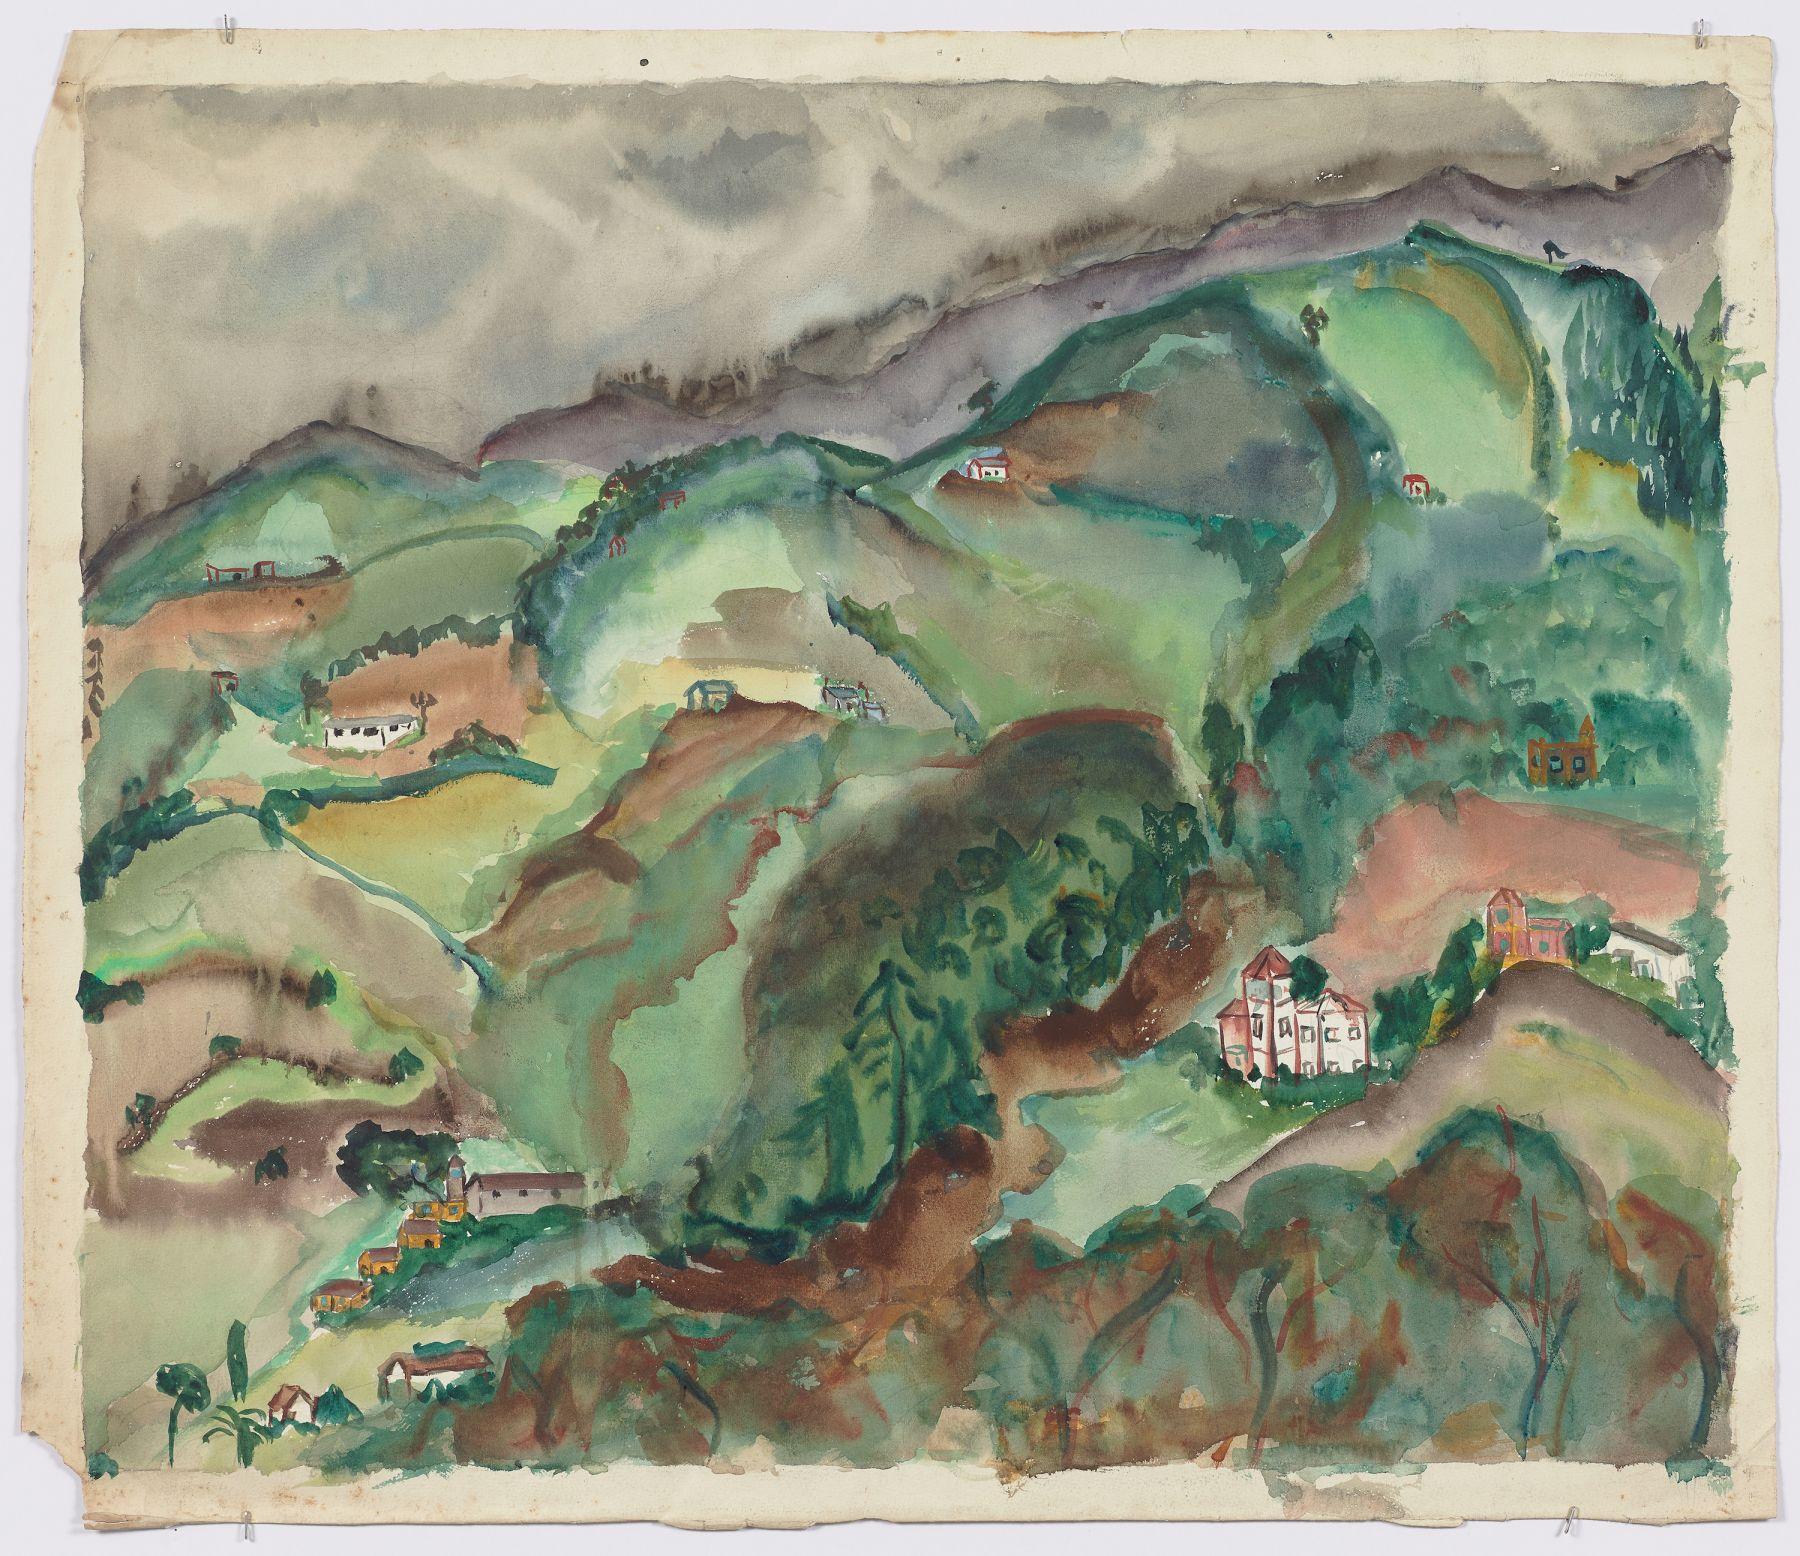 Canary Islands (1932)